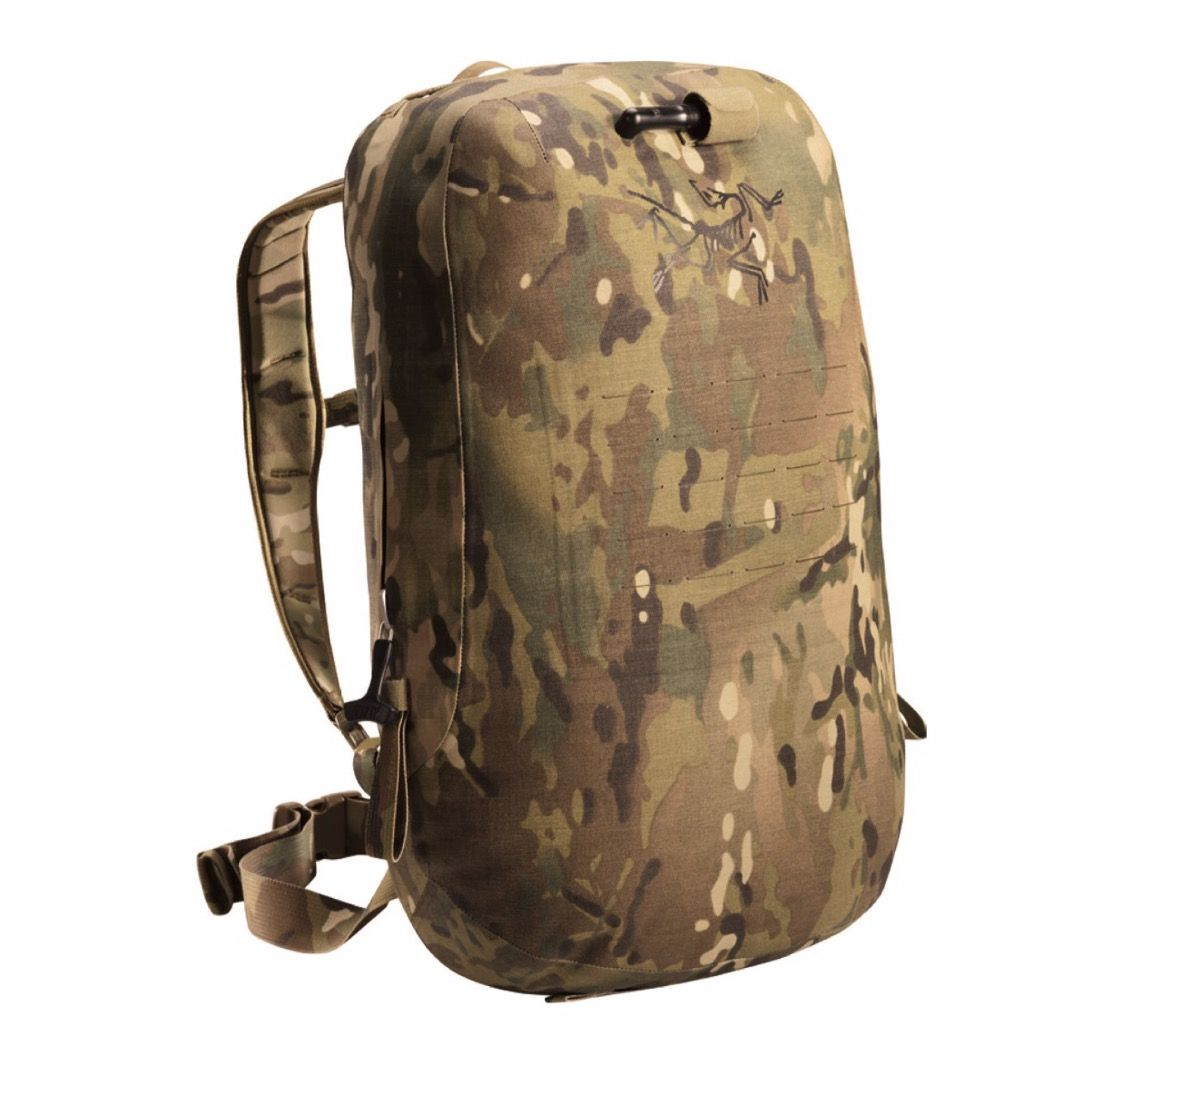 arc'teryx leaf backpacks